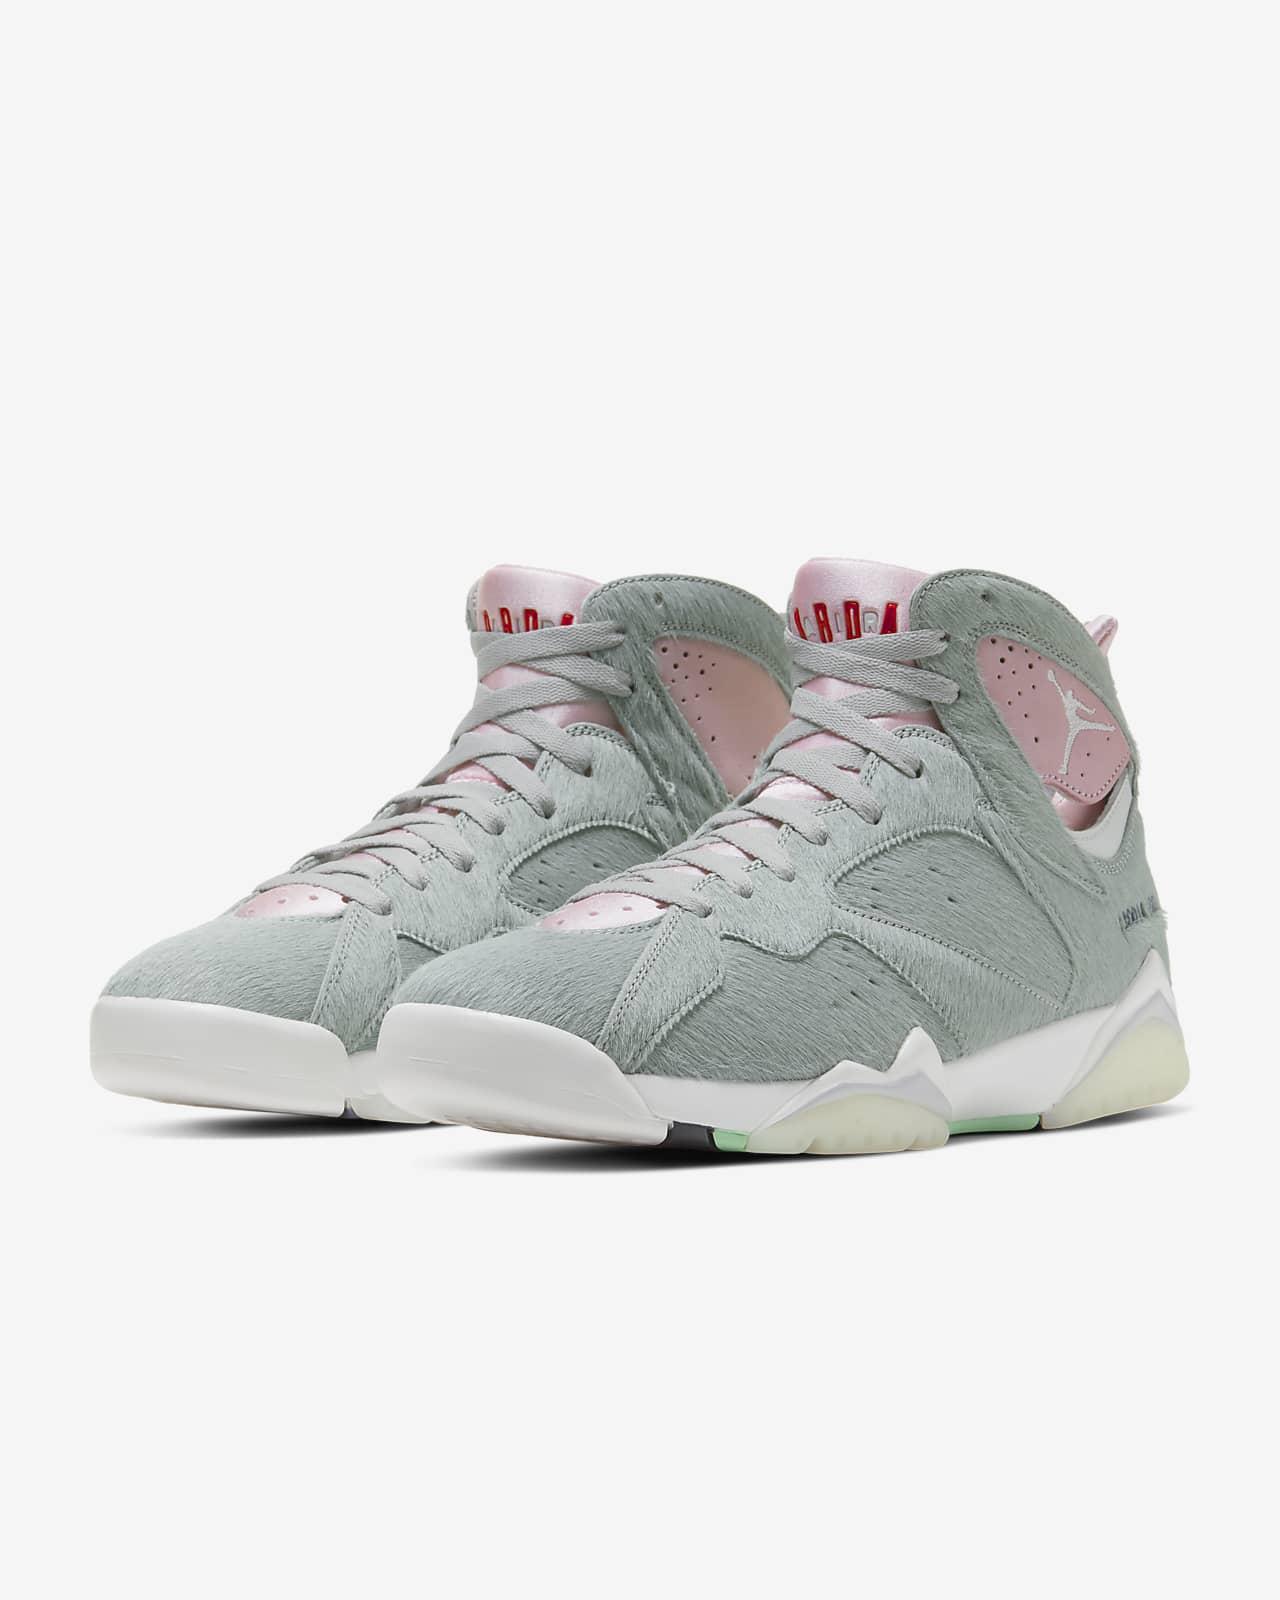 Air Jordan 7 Retro SE Shoe